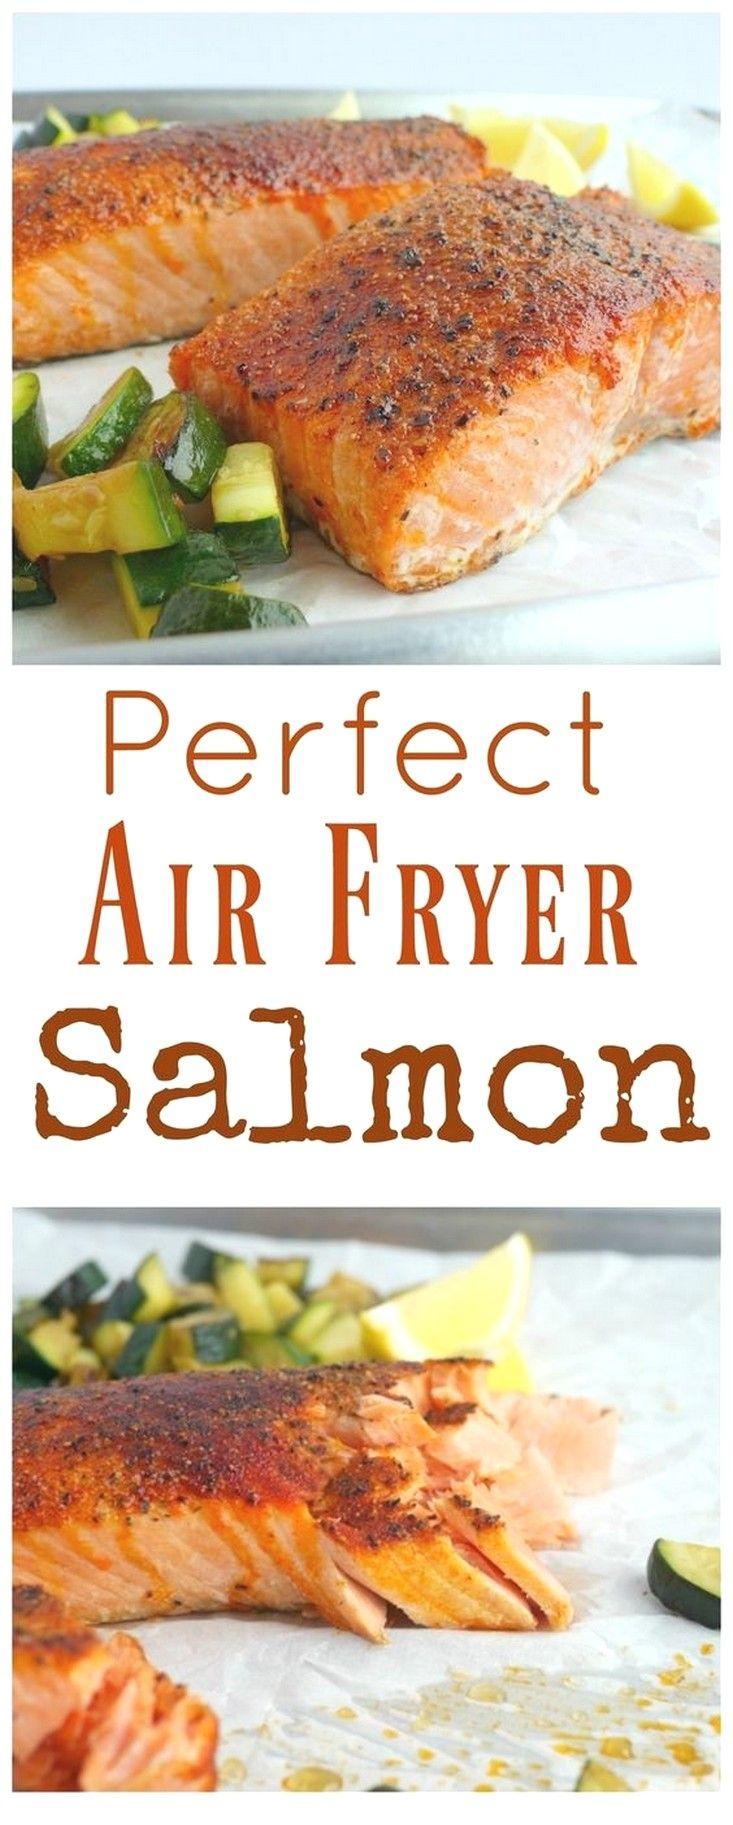 Easy Air-fryer Recipes | Perfect Air Fryer Salmon